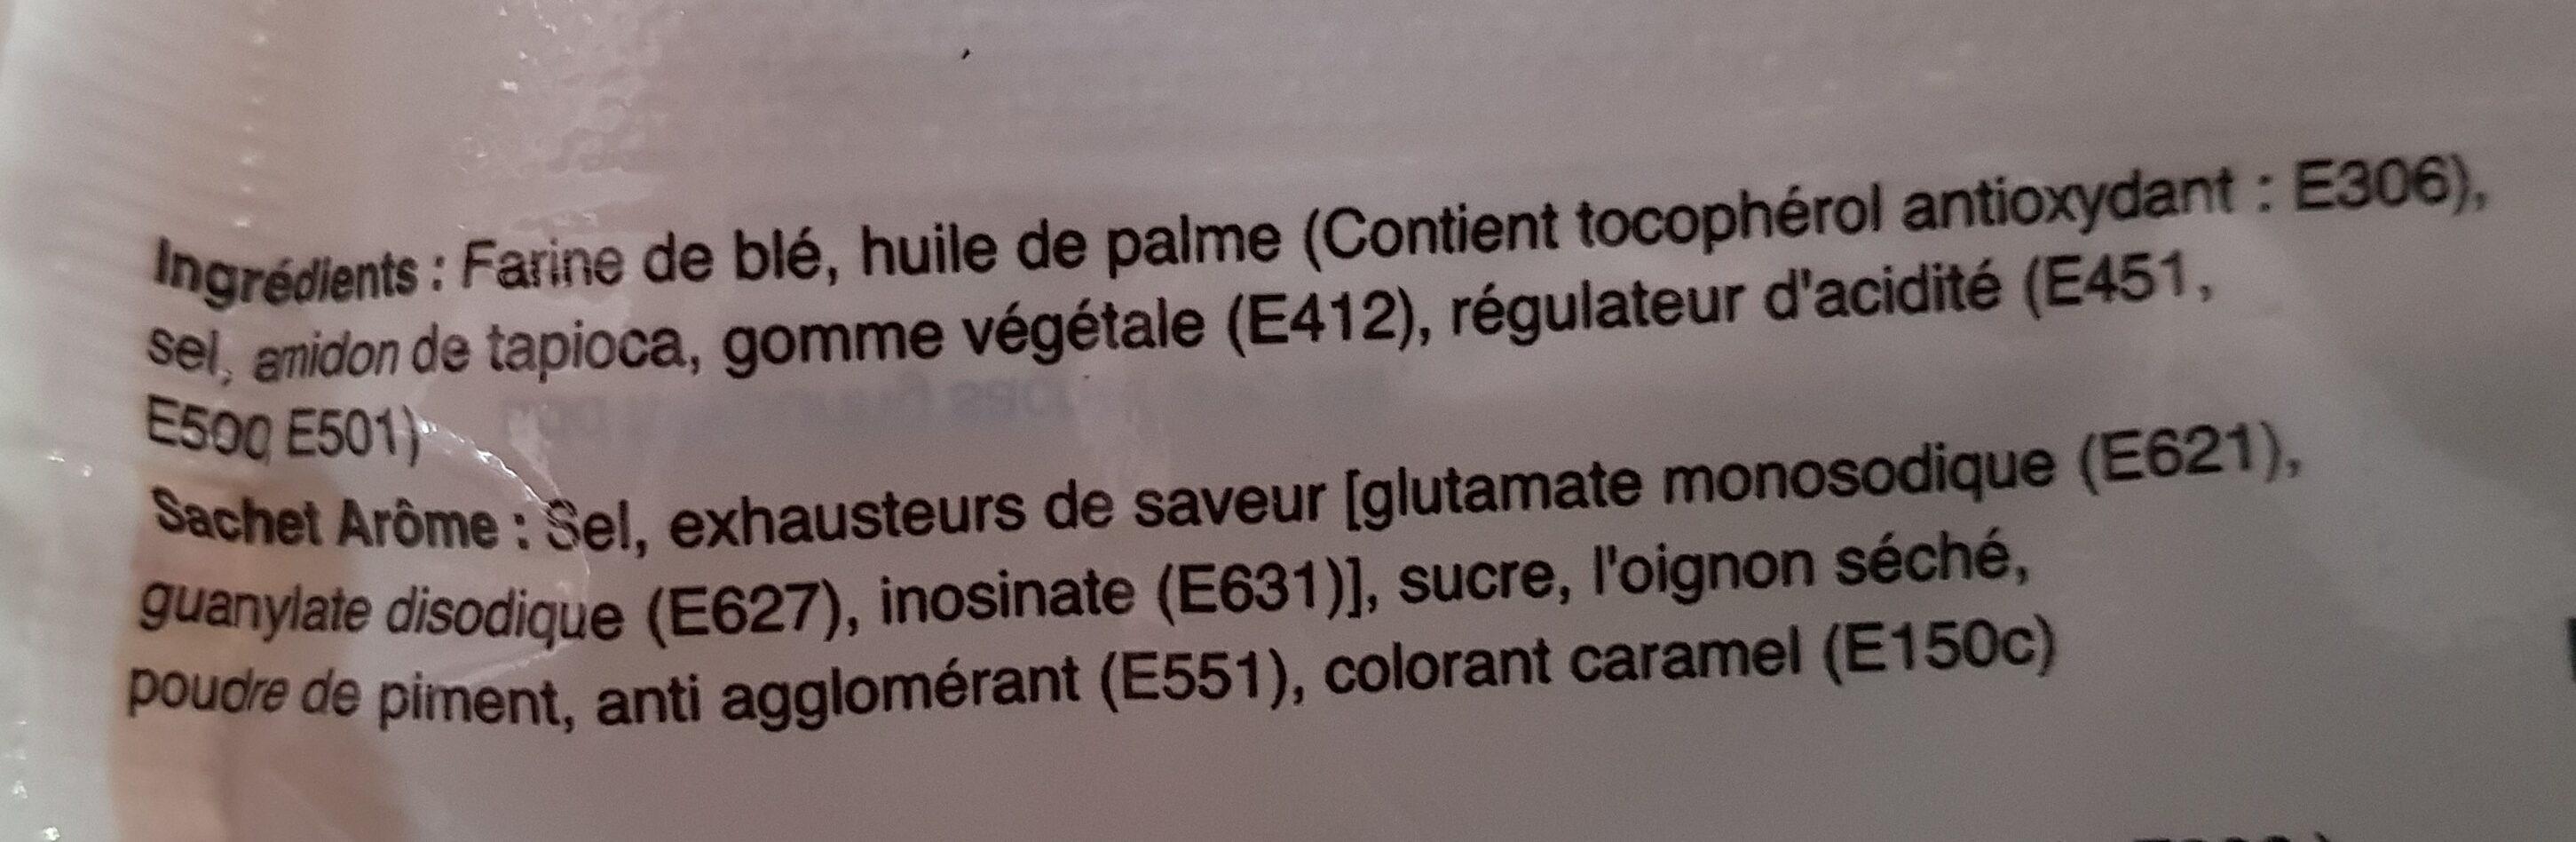 Nouilles Instantanées - Ingrediënten - fr